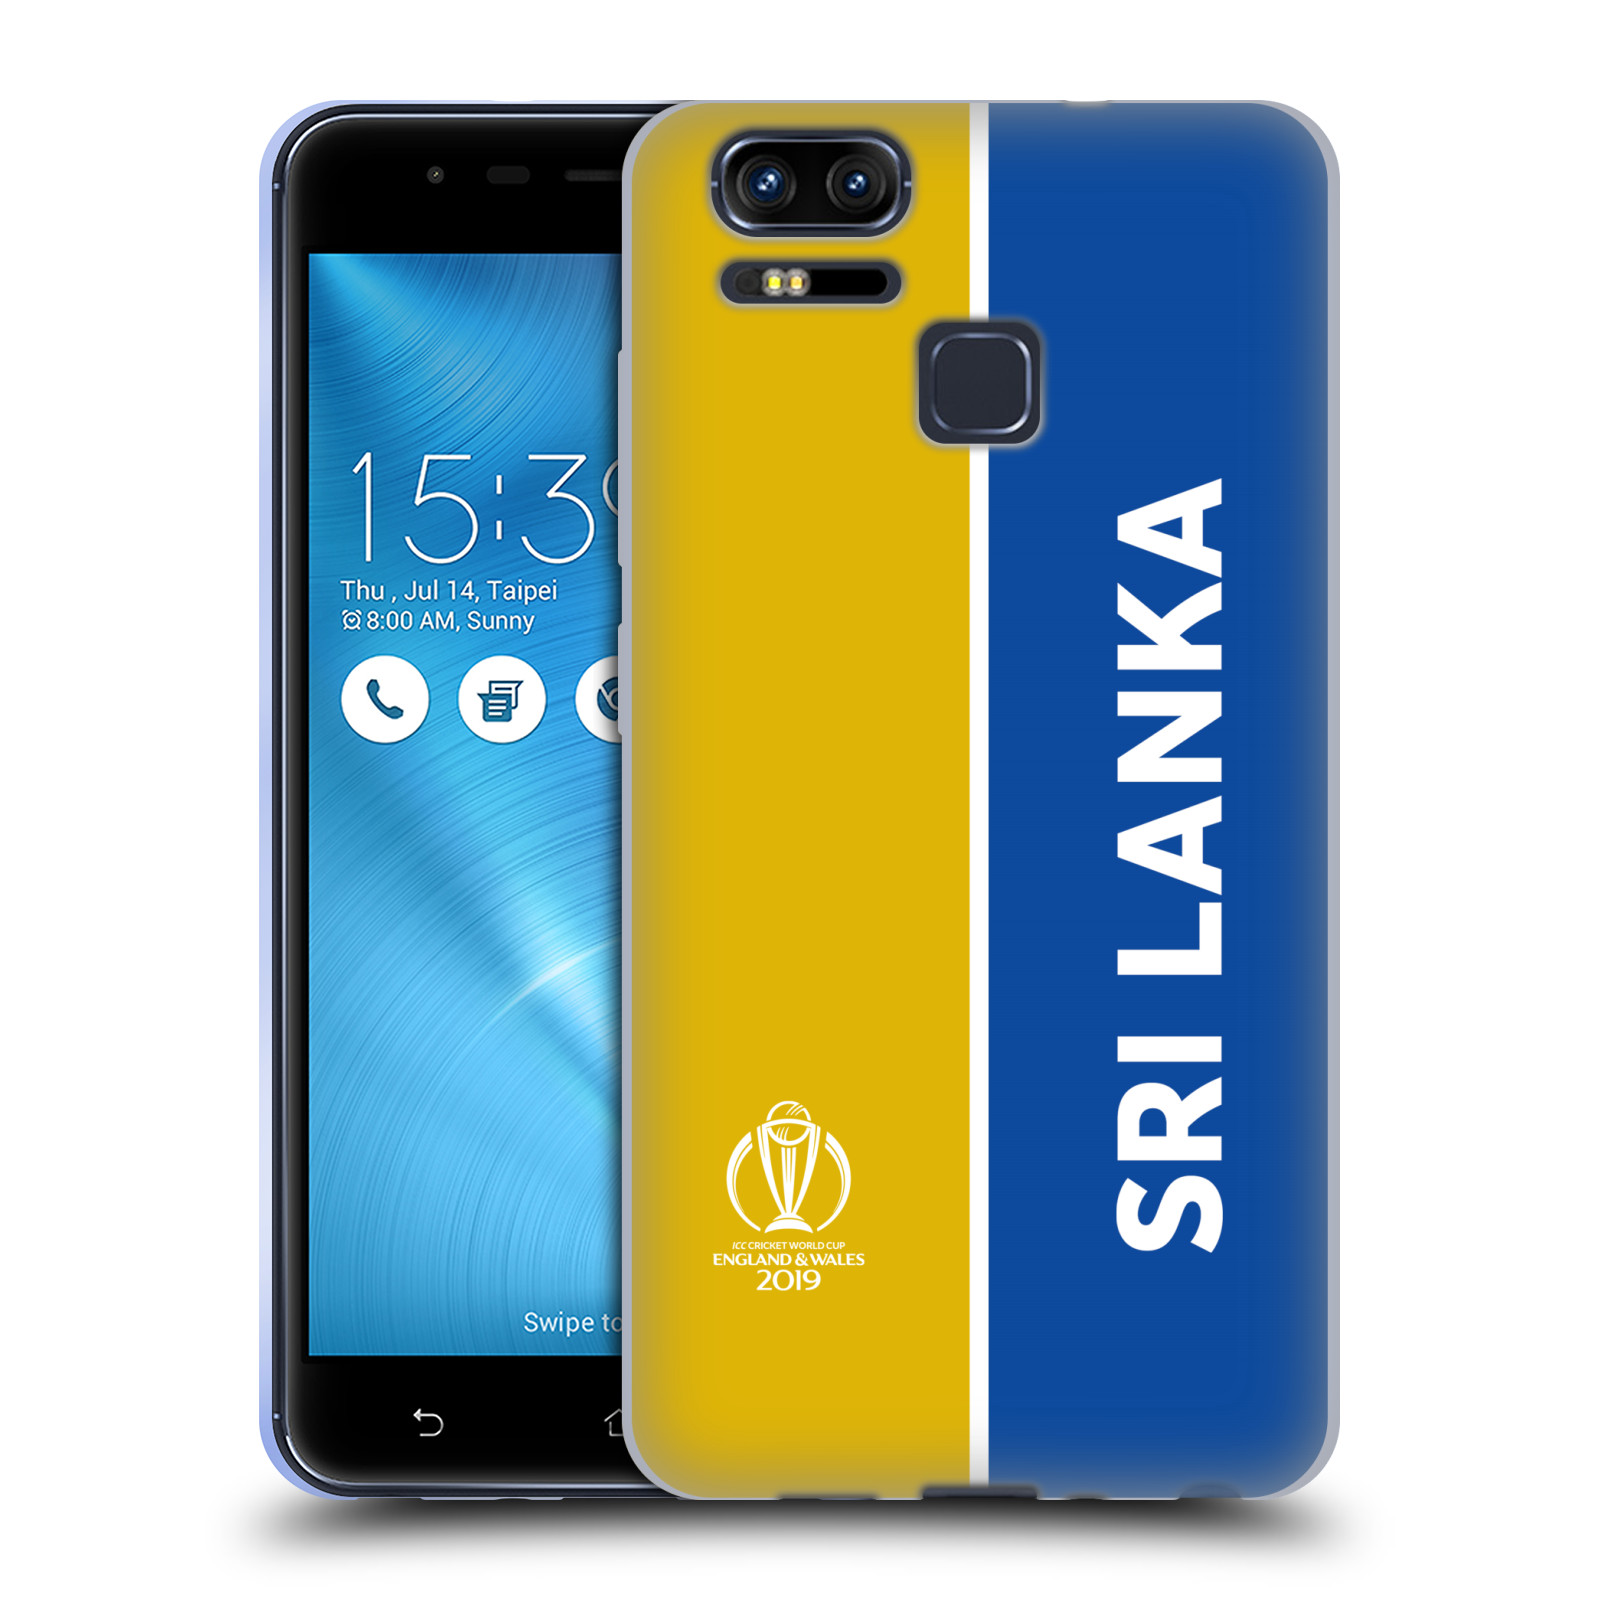 OFFICIAL-ICC-SRI-LANKA-CRICKET-WORLD-CUP-SOFT-GEL-CASE-FOR-ASUS-ZENFONE-PHONES